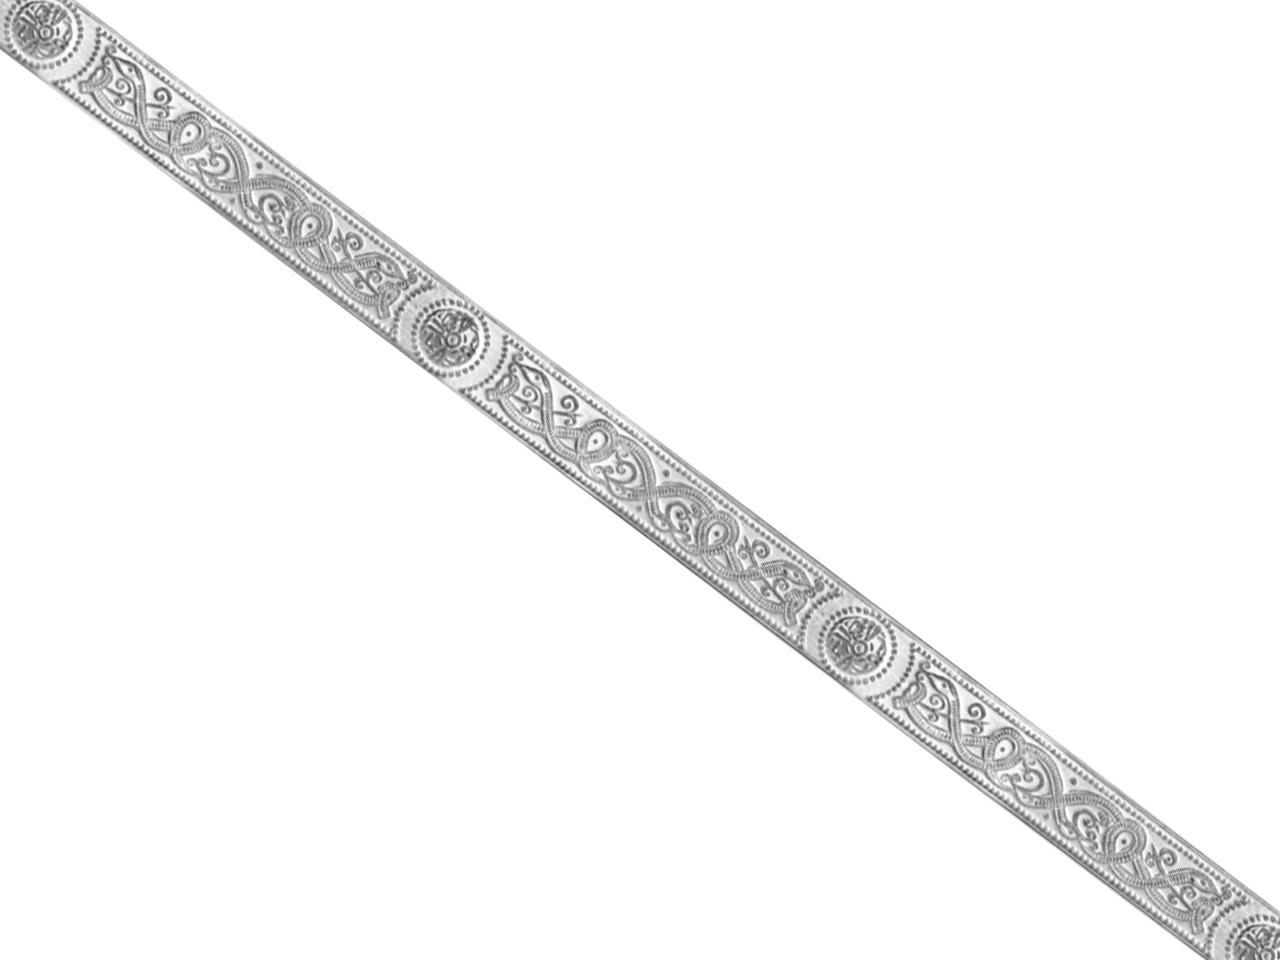 Sterling Silver Pattern Wire 3396 51g/mtr Half Hard, 1.0mm X 5mm ...